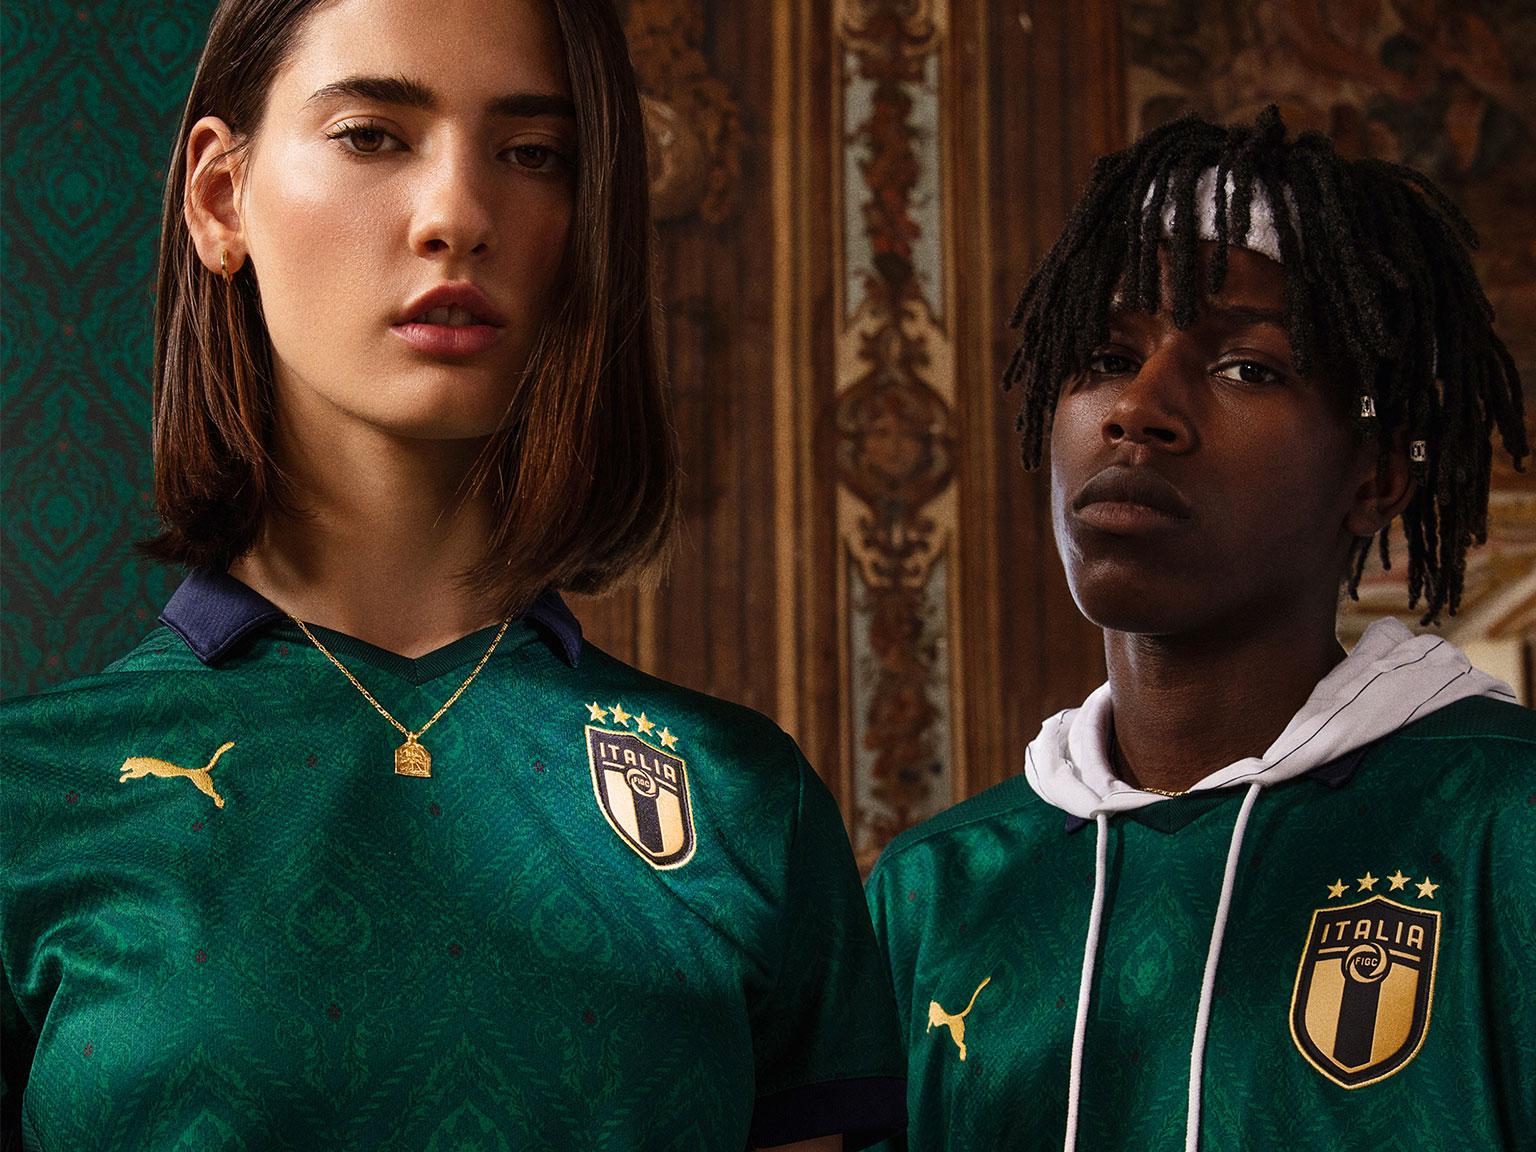 PUMA® - Italy Renaissance Kit celebrates a new wave of azurri talent